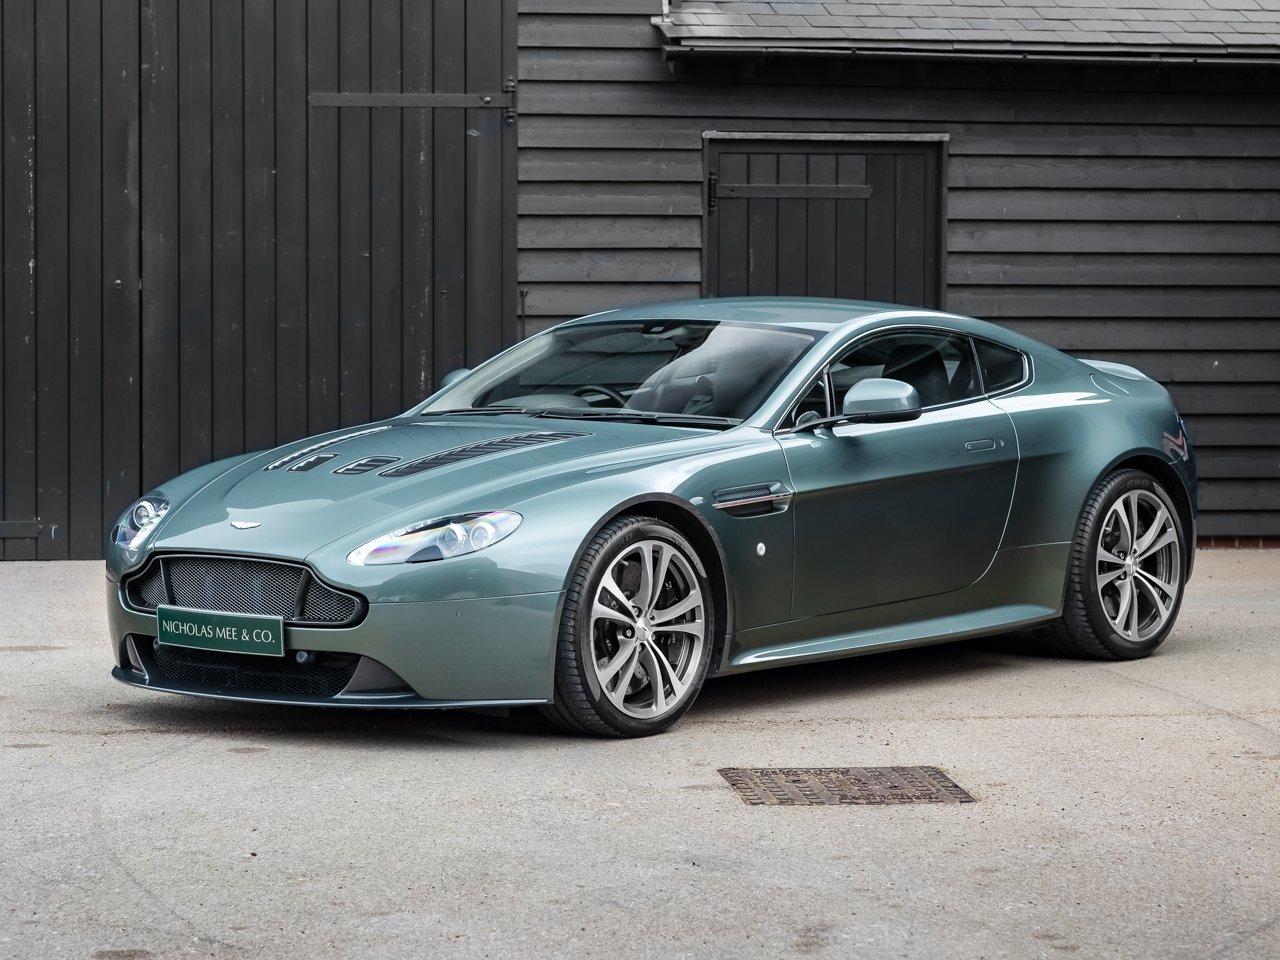 2014 Aston Martin V12 Vantage S Coupe Classic Driver Market